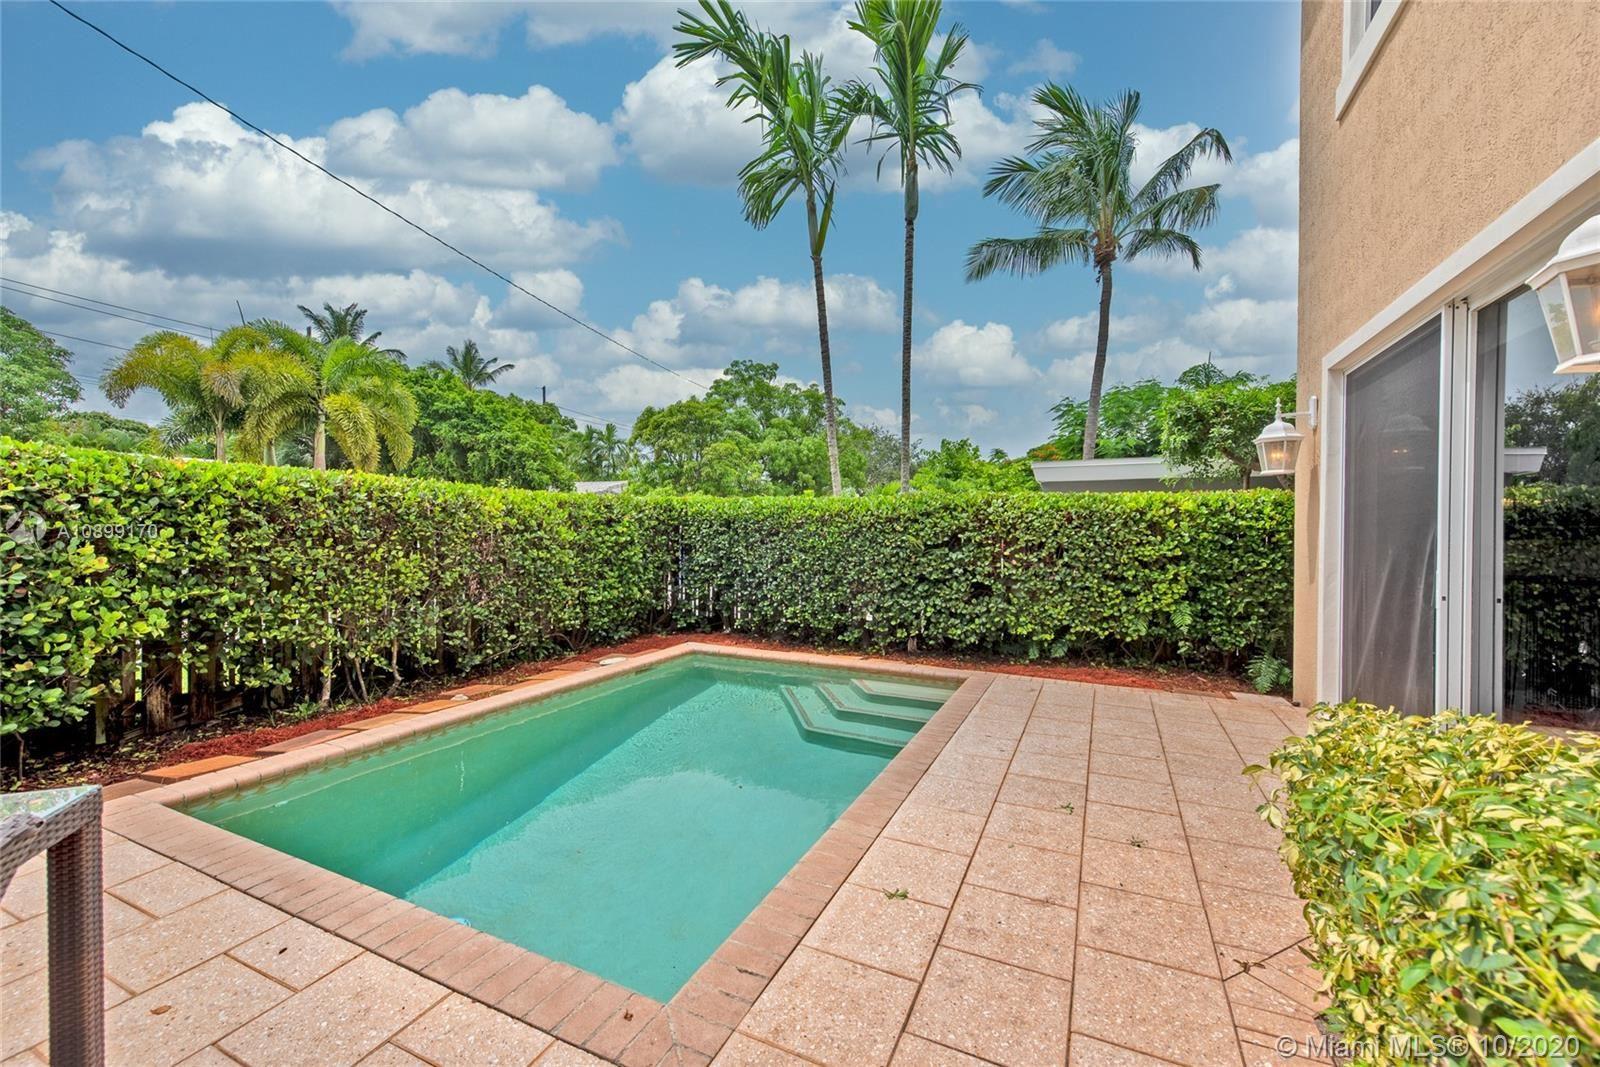 1303 NE 12th St, Fort Lauderdale, FL 33304 - #: A10899170